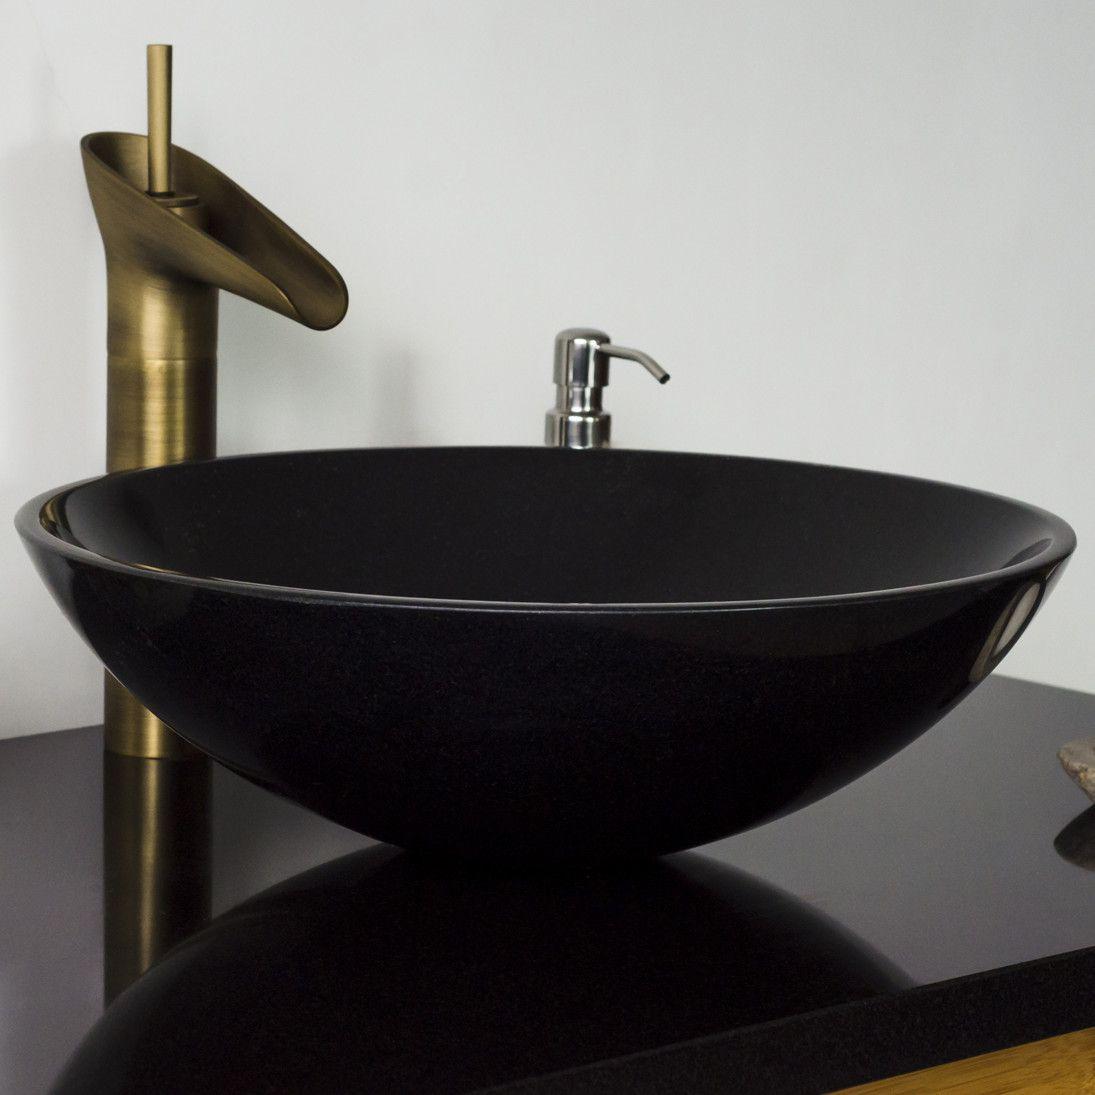 Brockini Vessel Bathroom Sink Bathroom Sink Sink